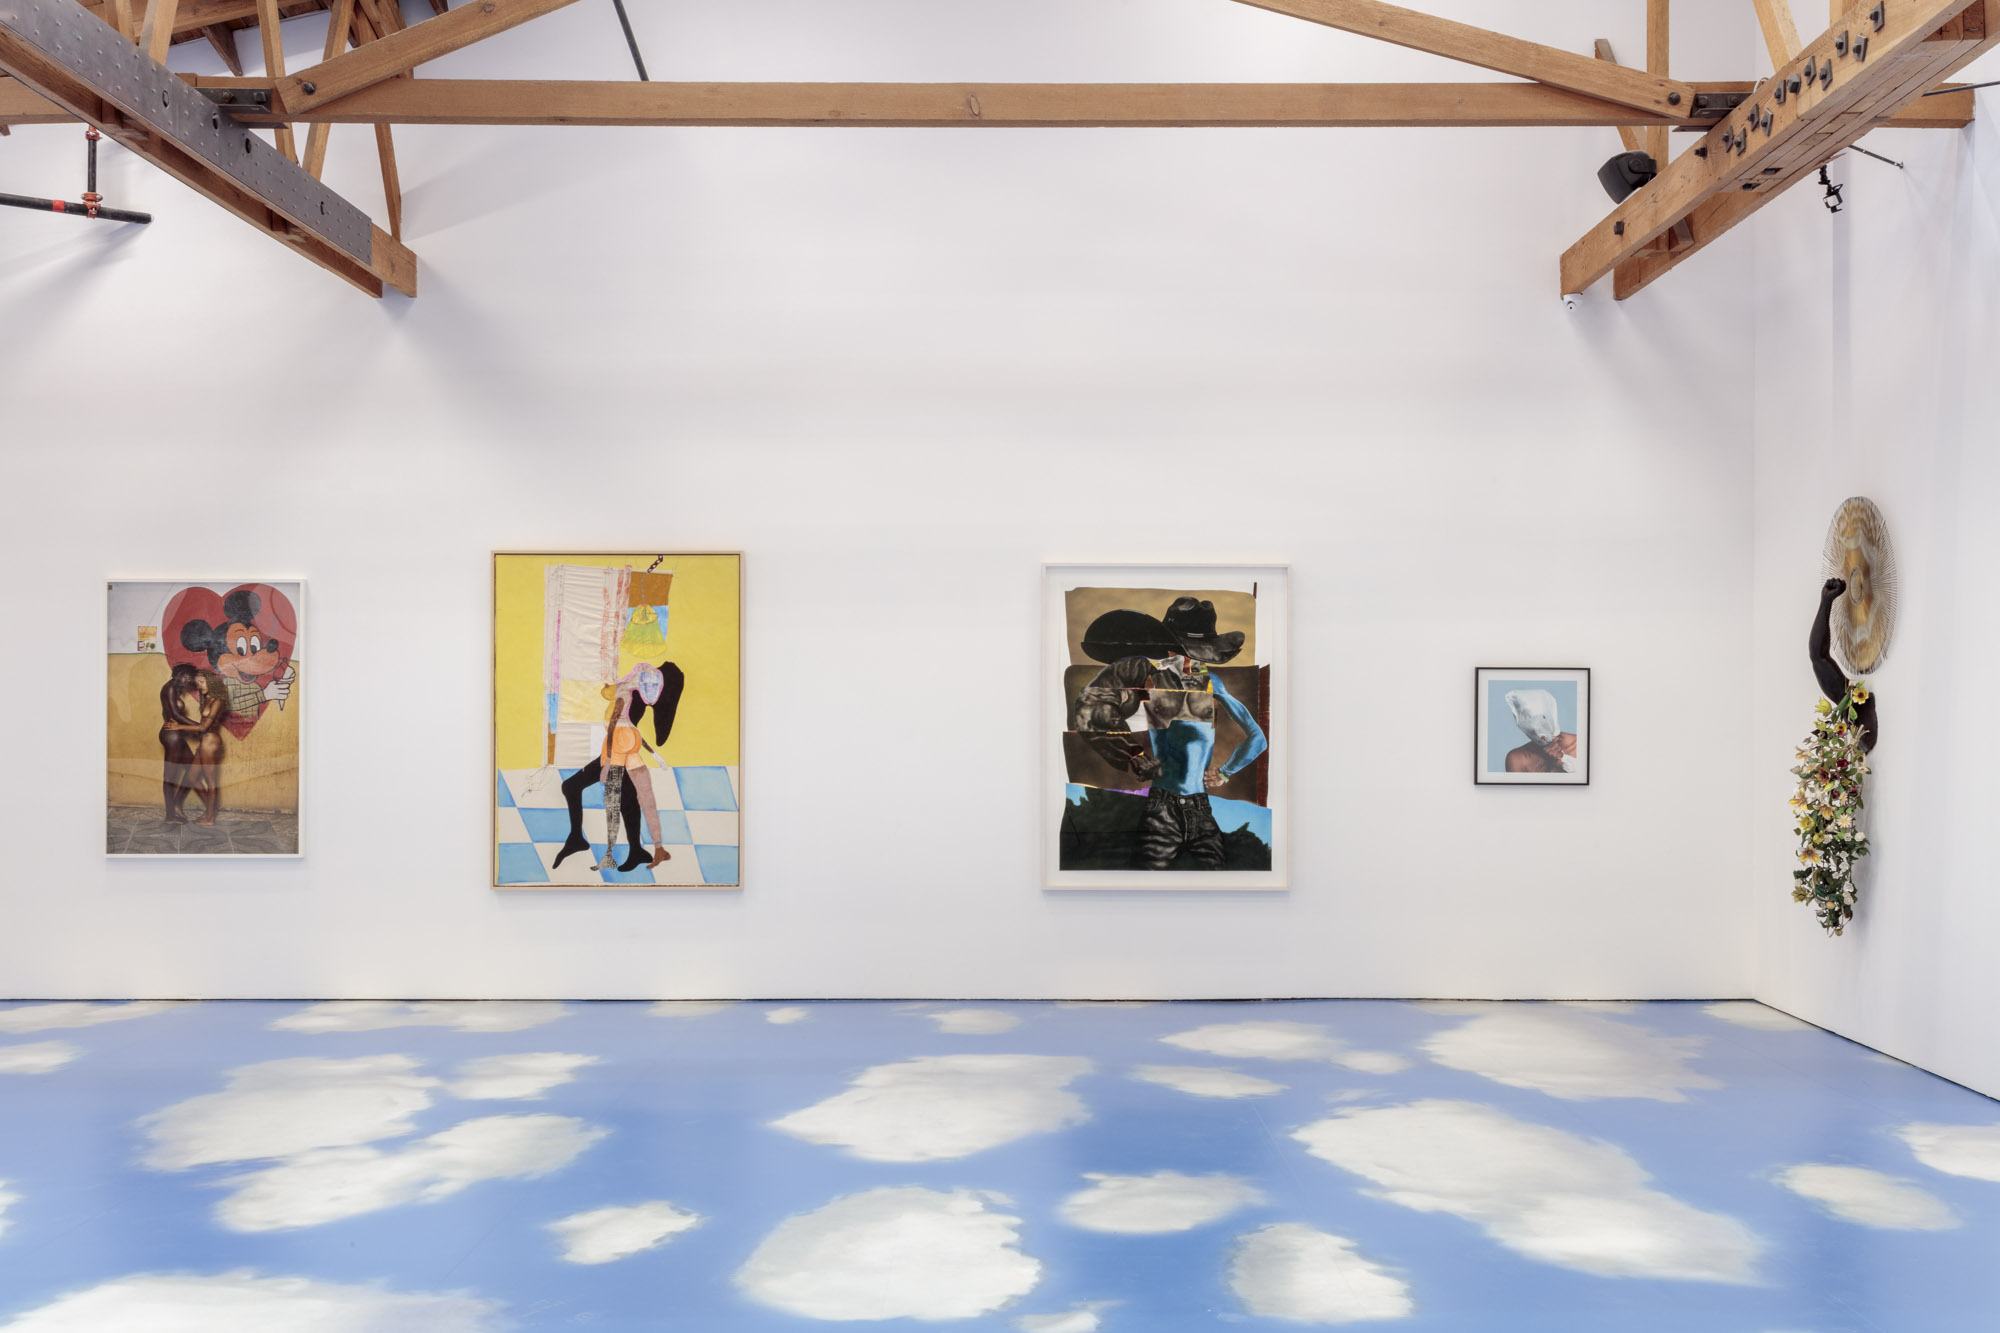 Dreamweavers, art exhibit @ UTA Artist Space // photo source: utaartistspace.com